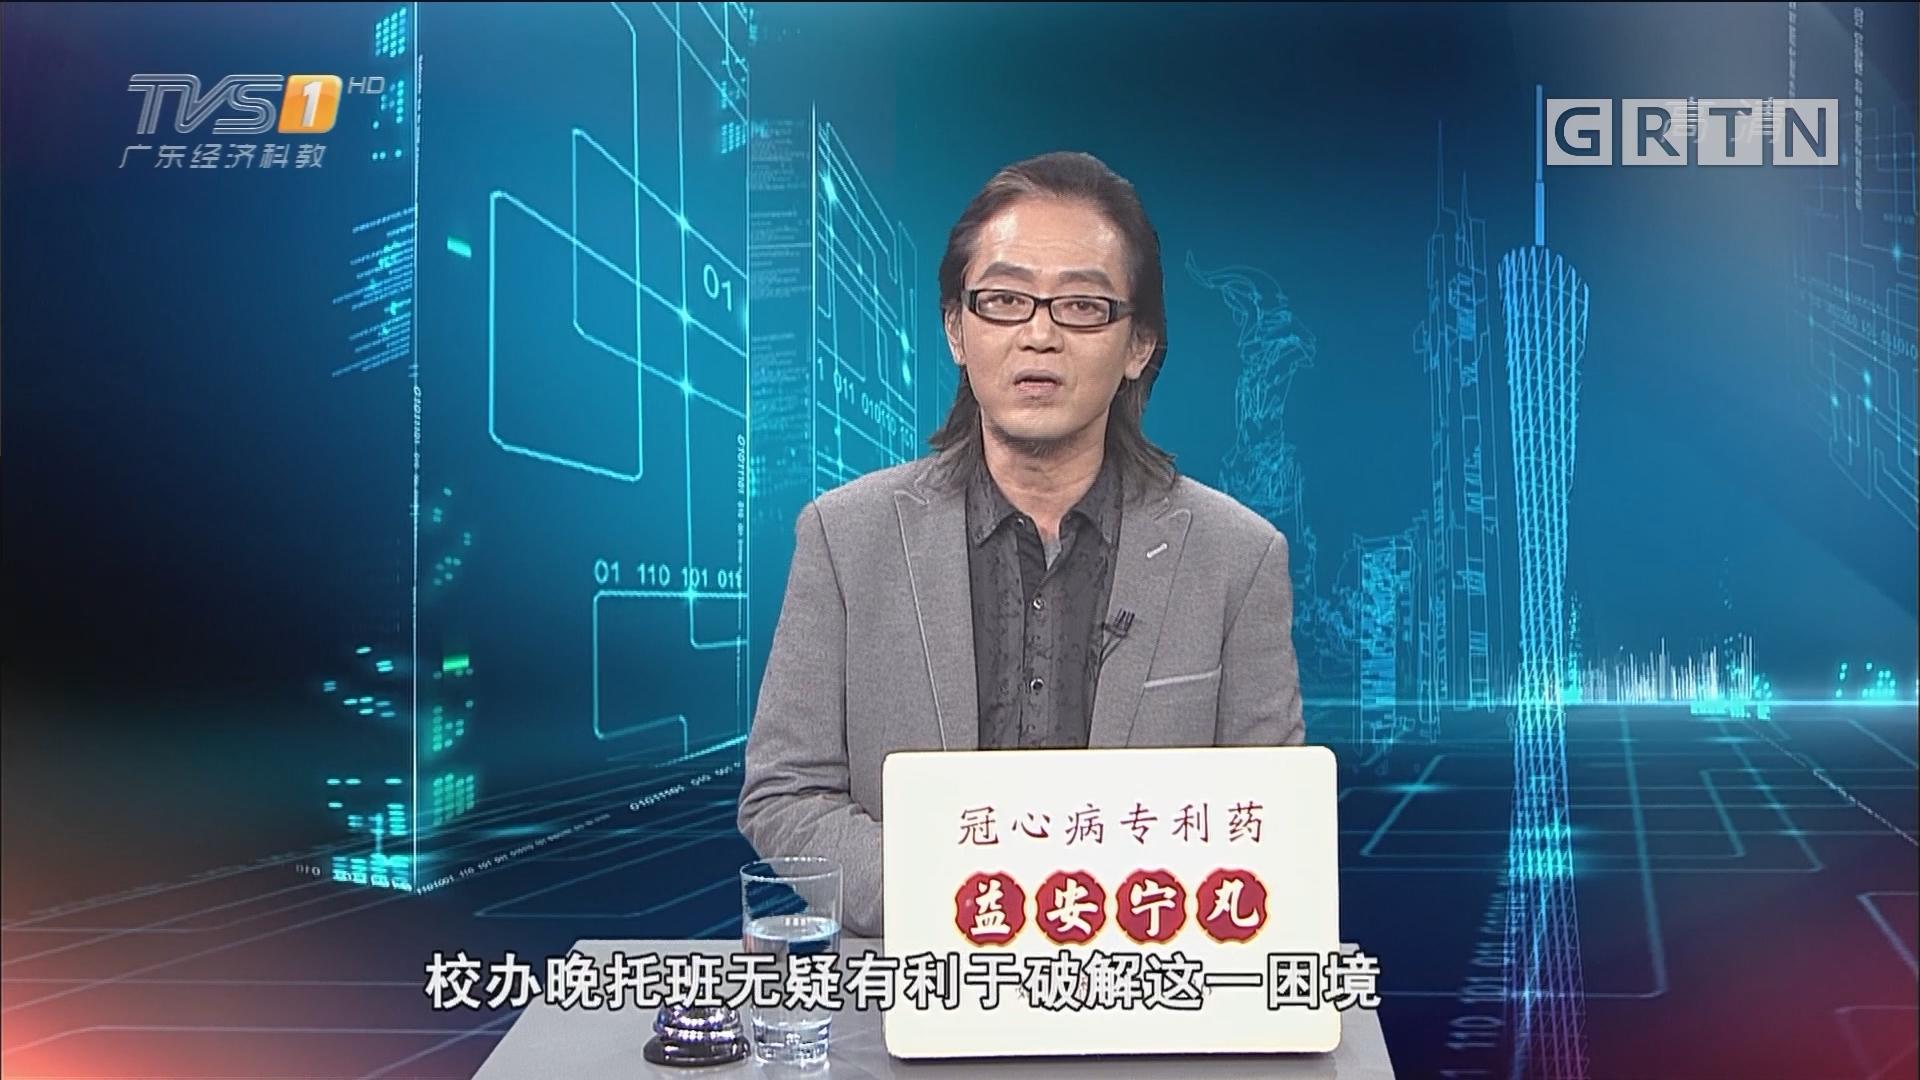 [HD][2017-11-28]马后炮:将晚托班当重要民生工程来抓